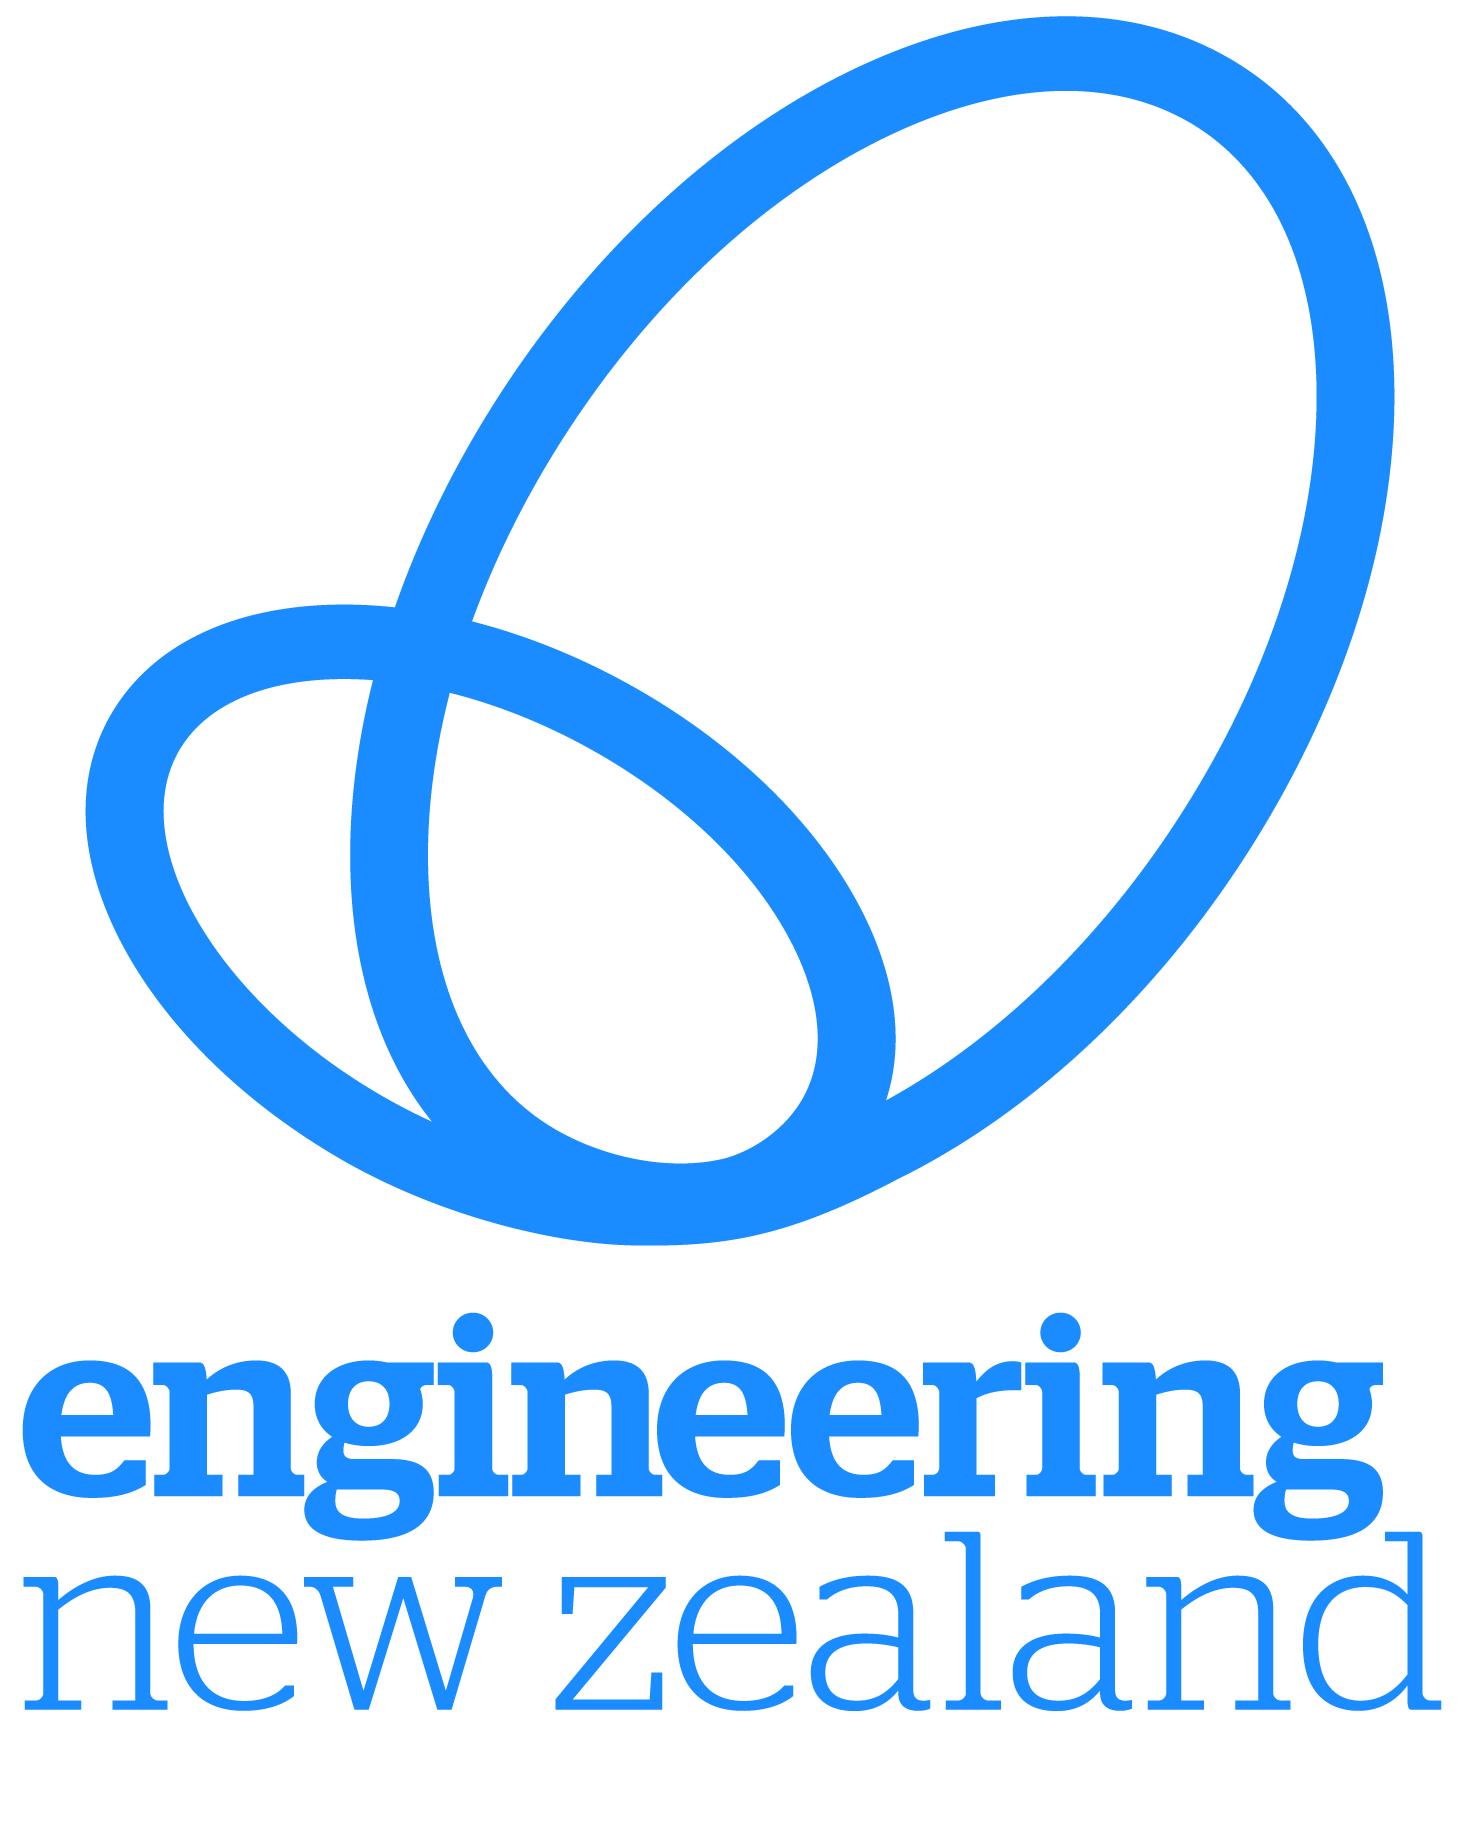 Engineering New Zealand logo